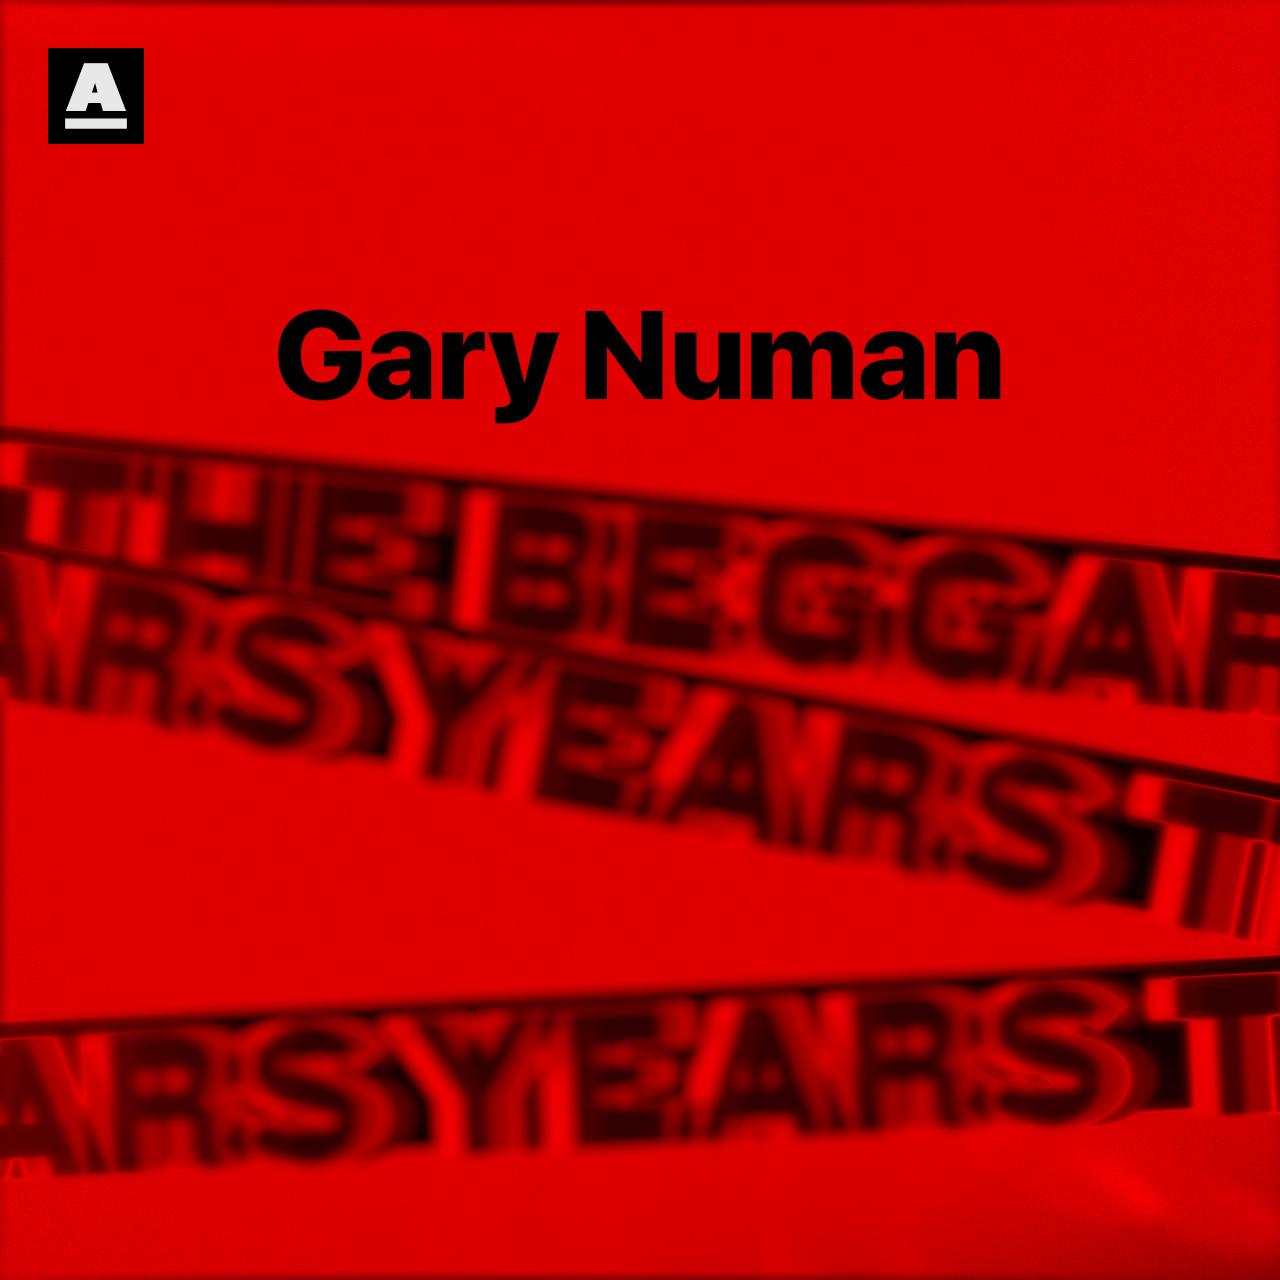 Gary Numan – The Beggars Years